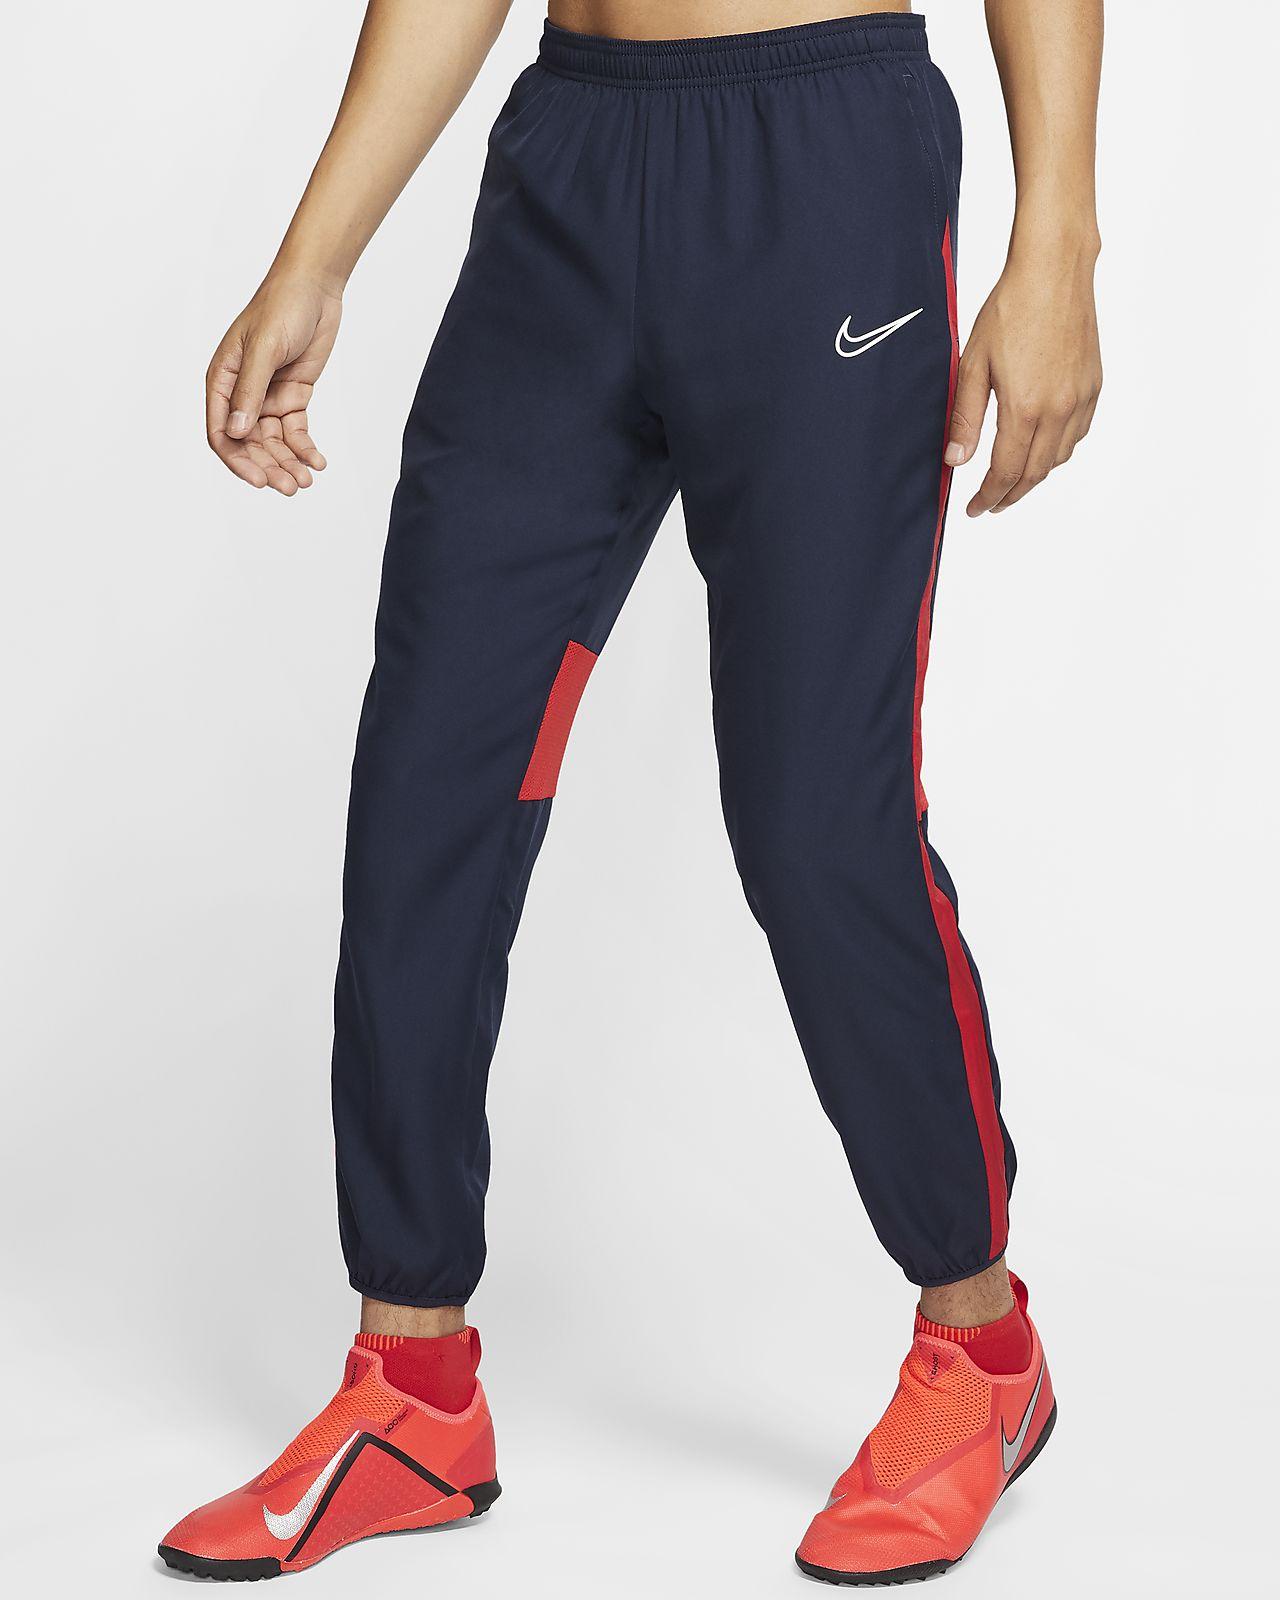 Nike Dri FIT Academy férfi futballnadrág. Nike HU